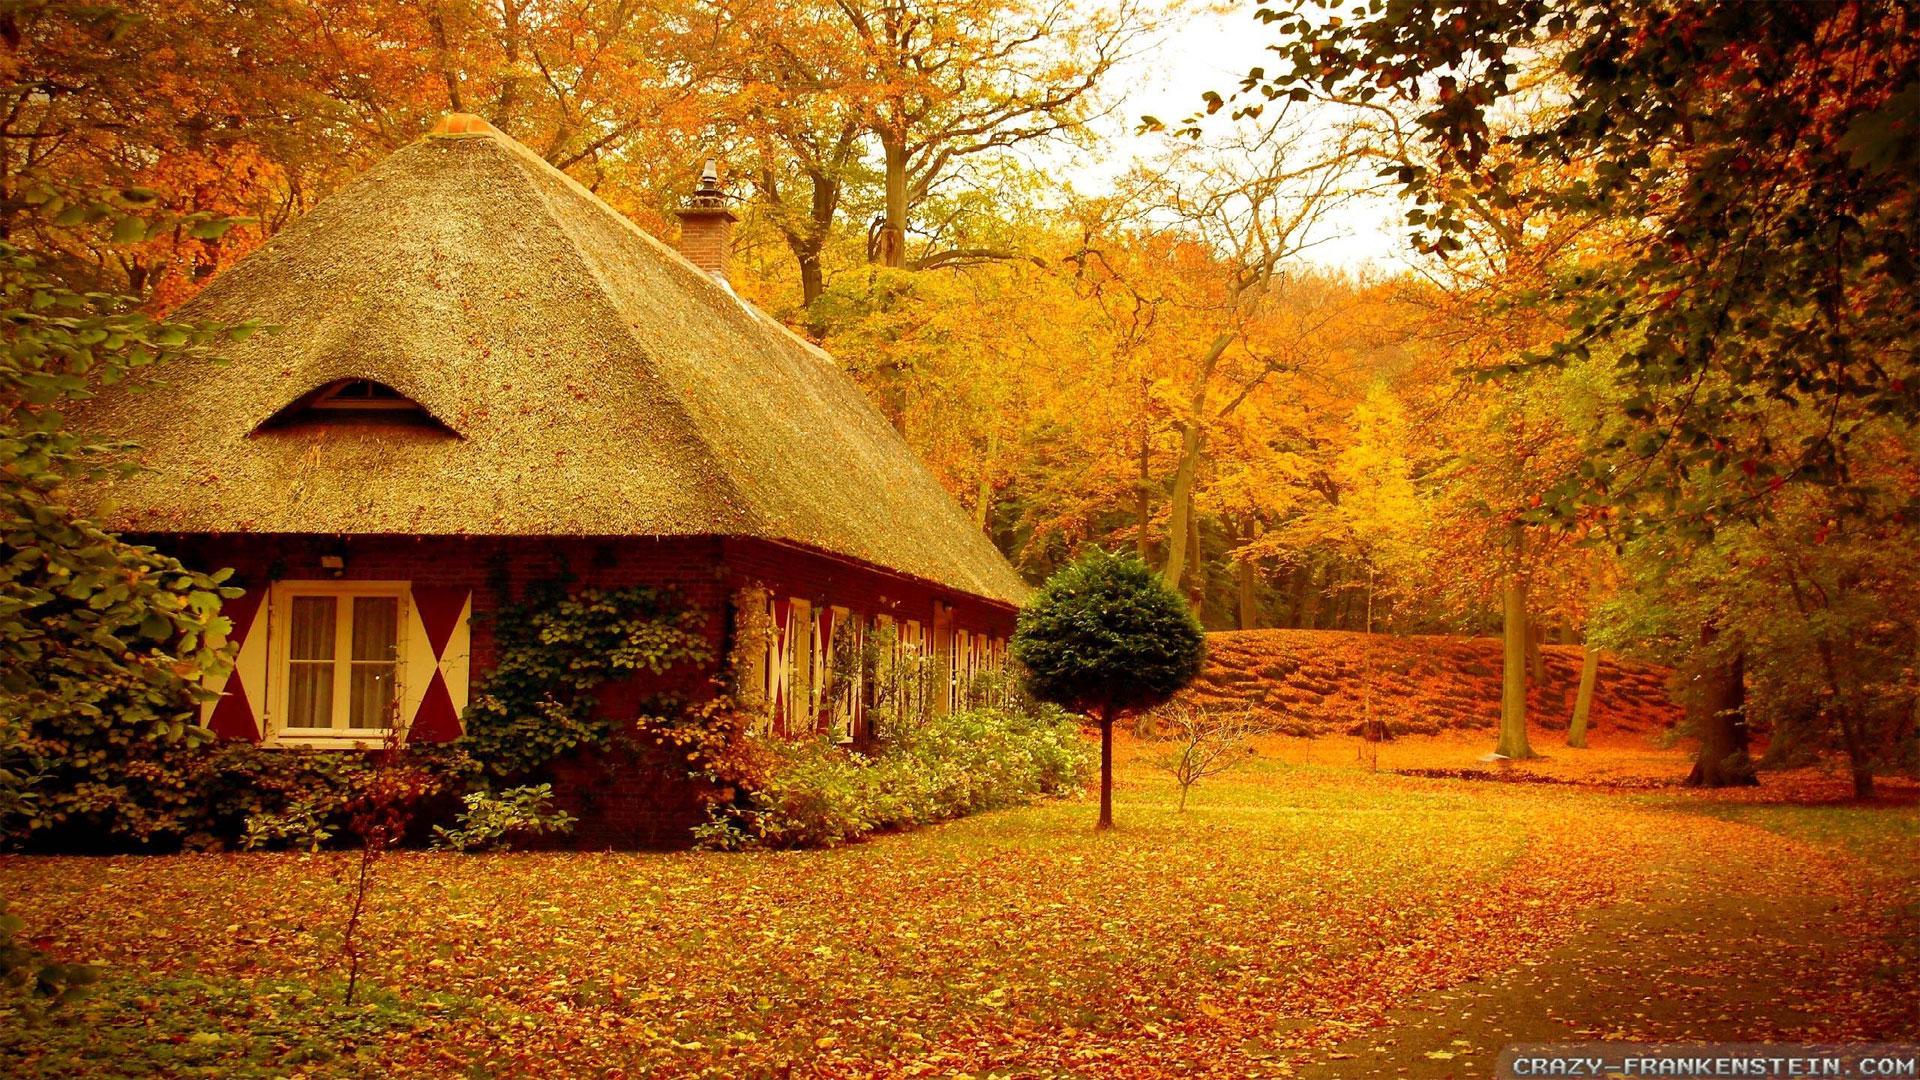 autumn scene wallpapers 54 autumn wallpaper examples for your desktop background